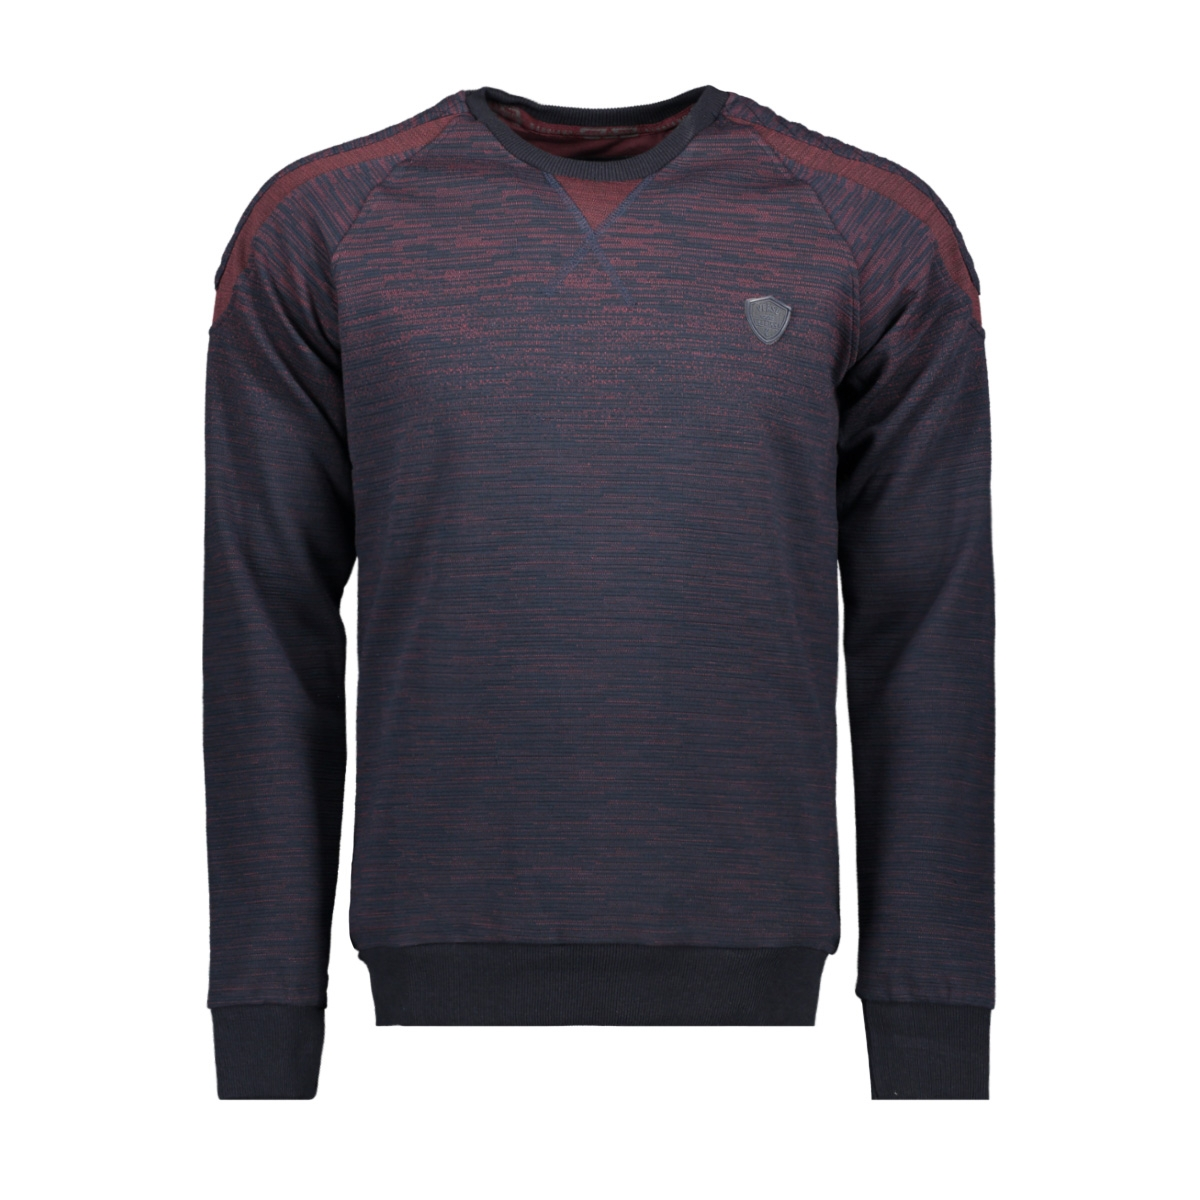 sweater 77080 gabbiano sweater bordeaux